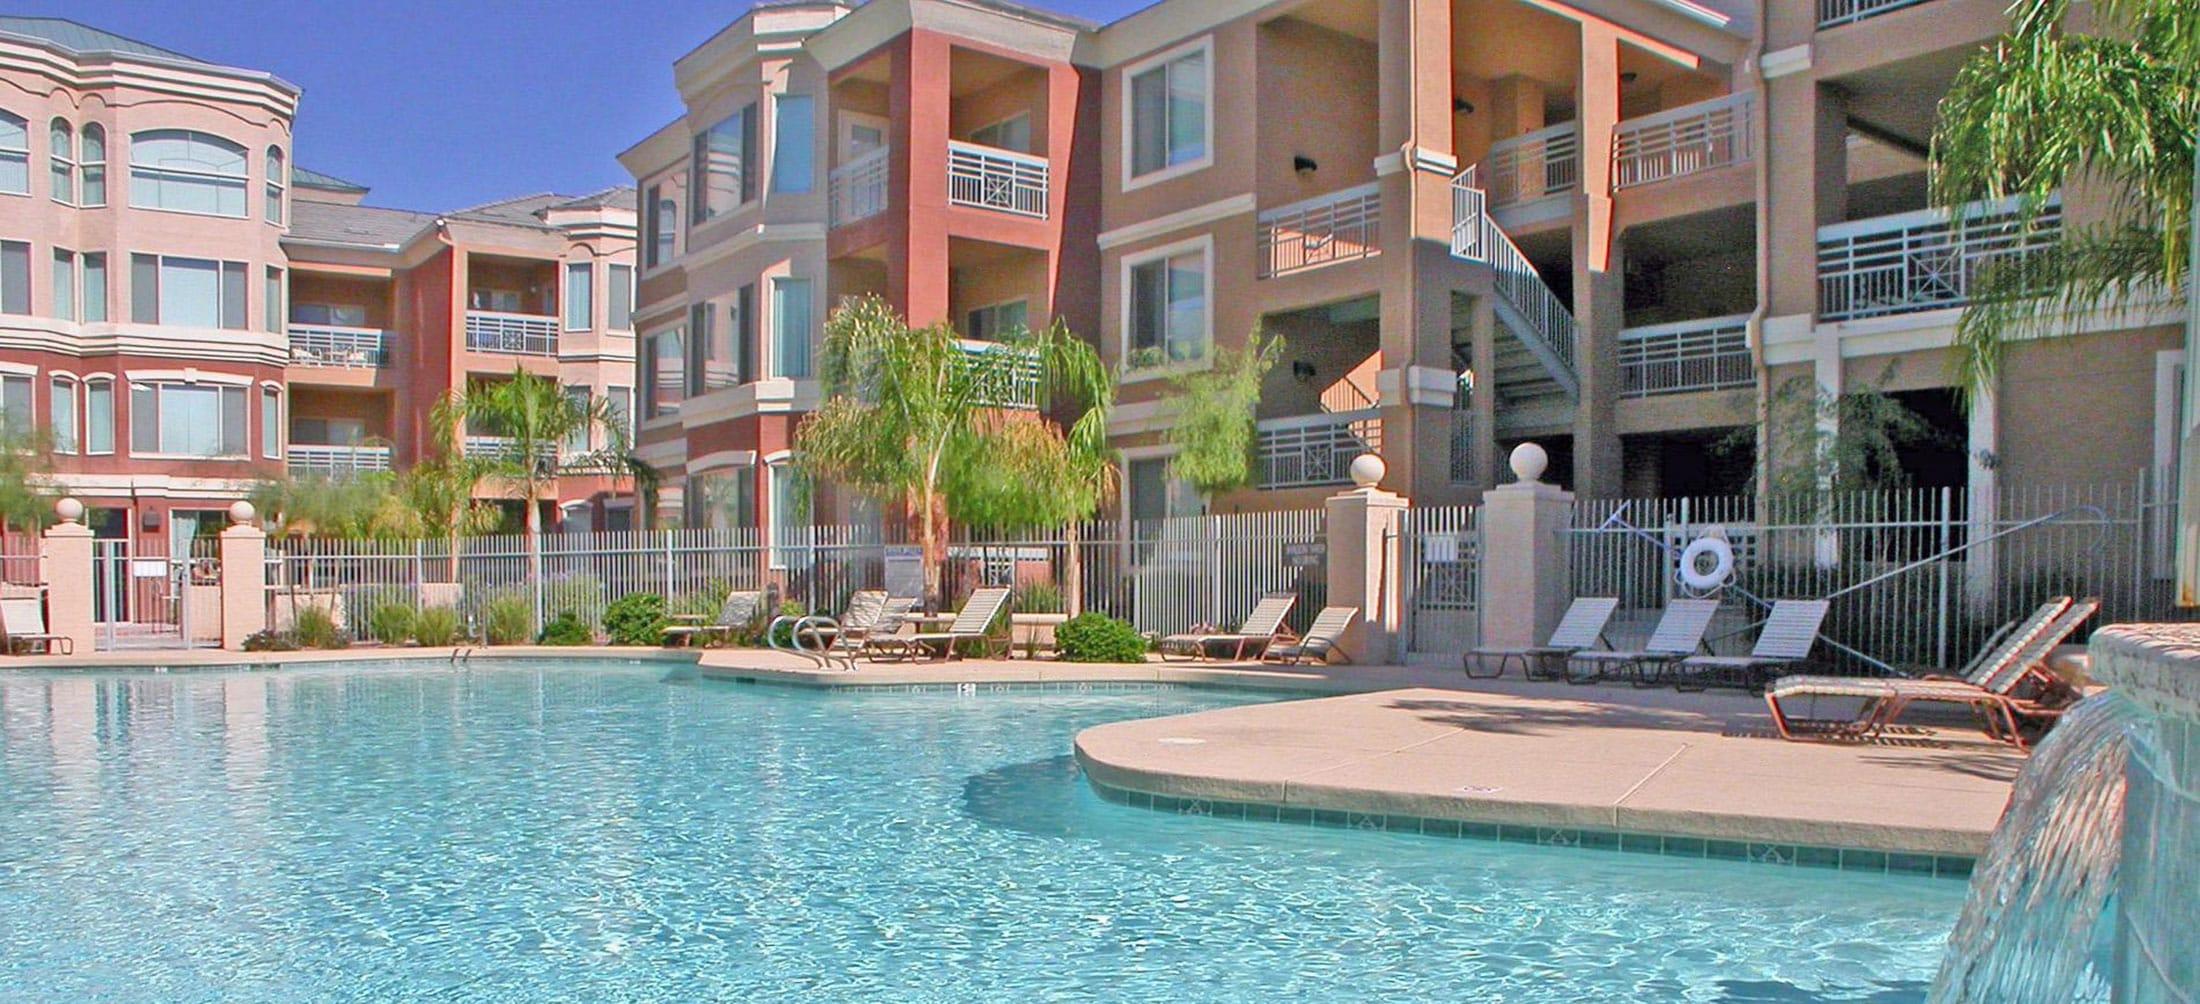 Regatta Pointe Condominiums Apartments in Tempe AZ